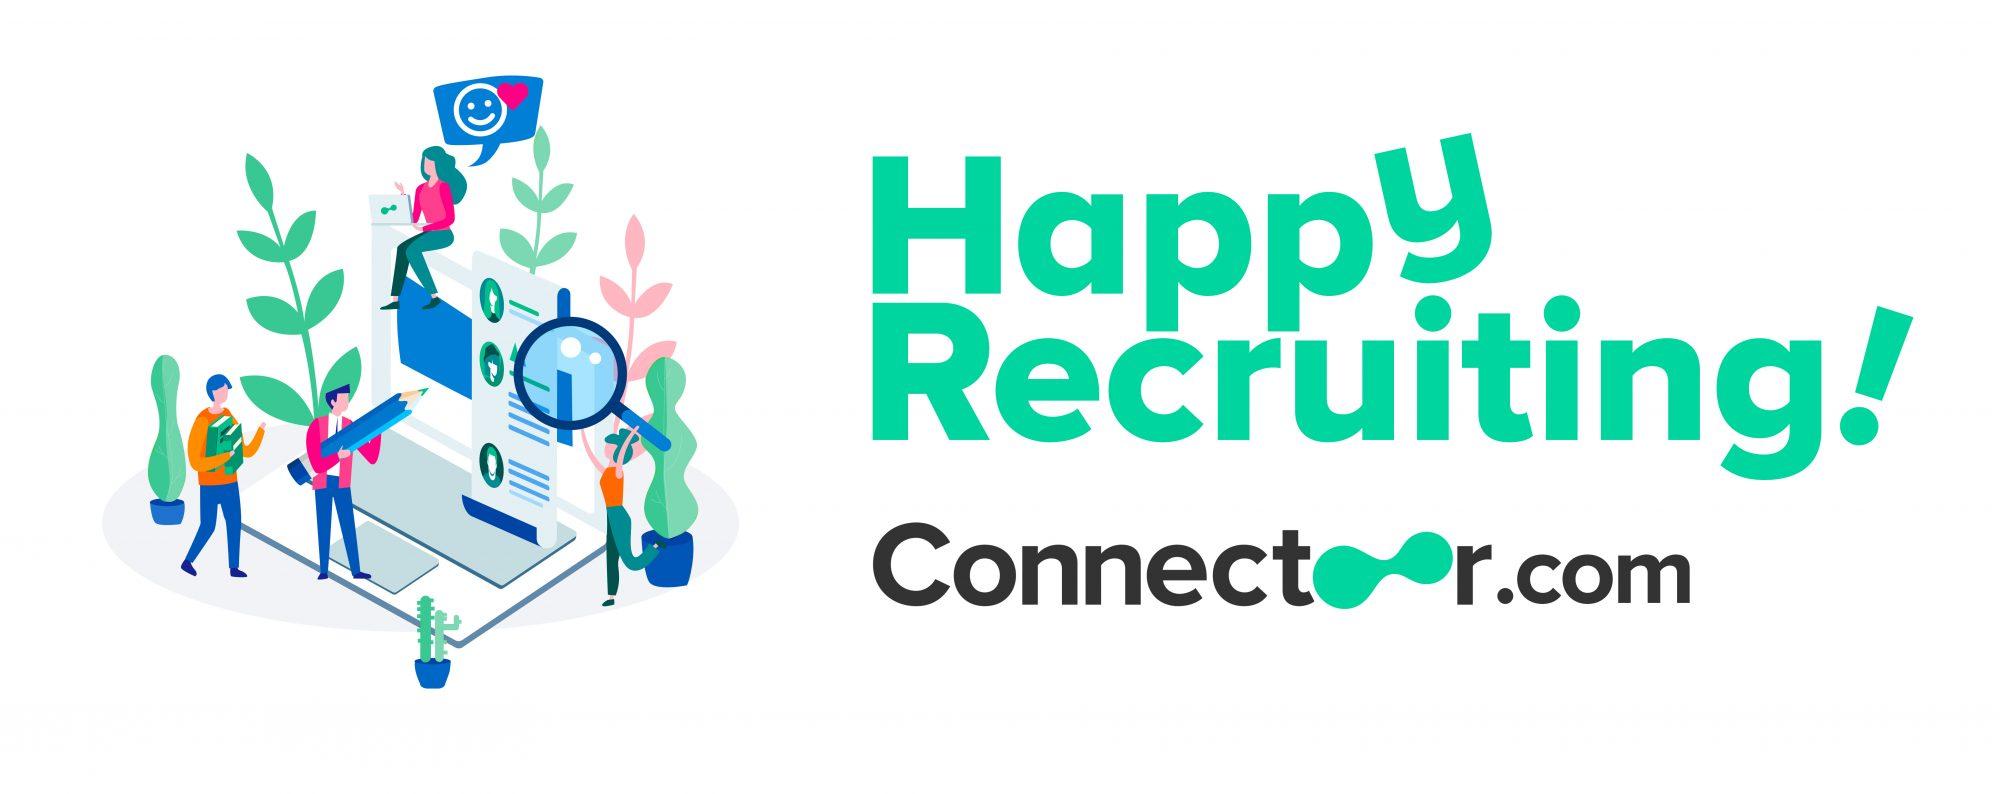 Happy Recruiting